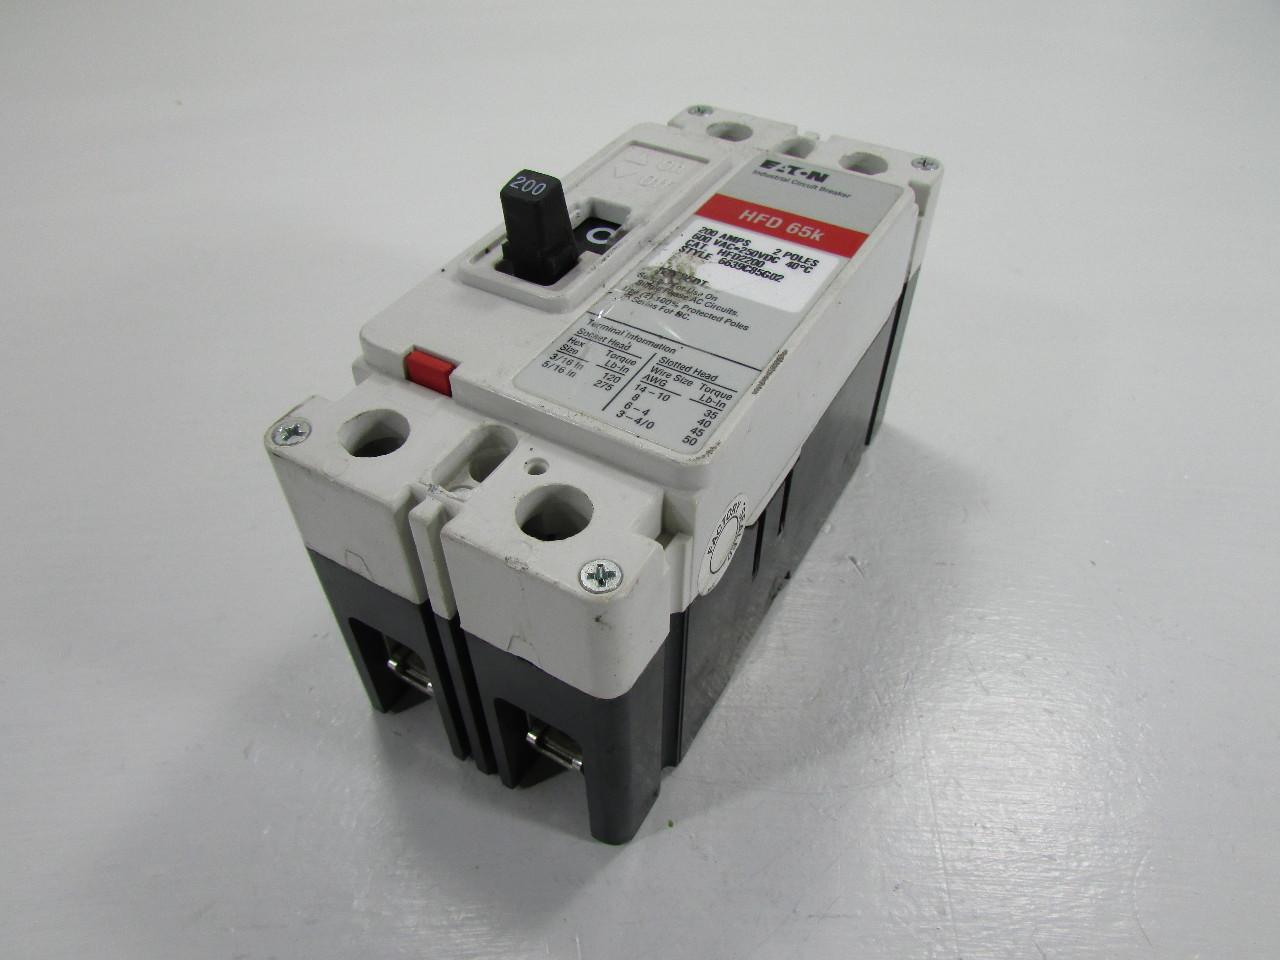 Eaton Hfd 65k Cat Hfd2200 Industrial Circuit Breaker 200